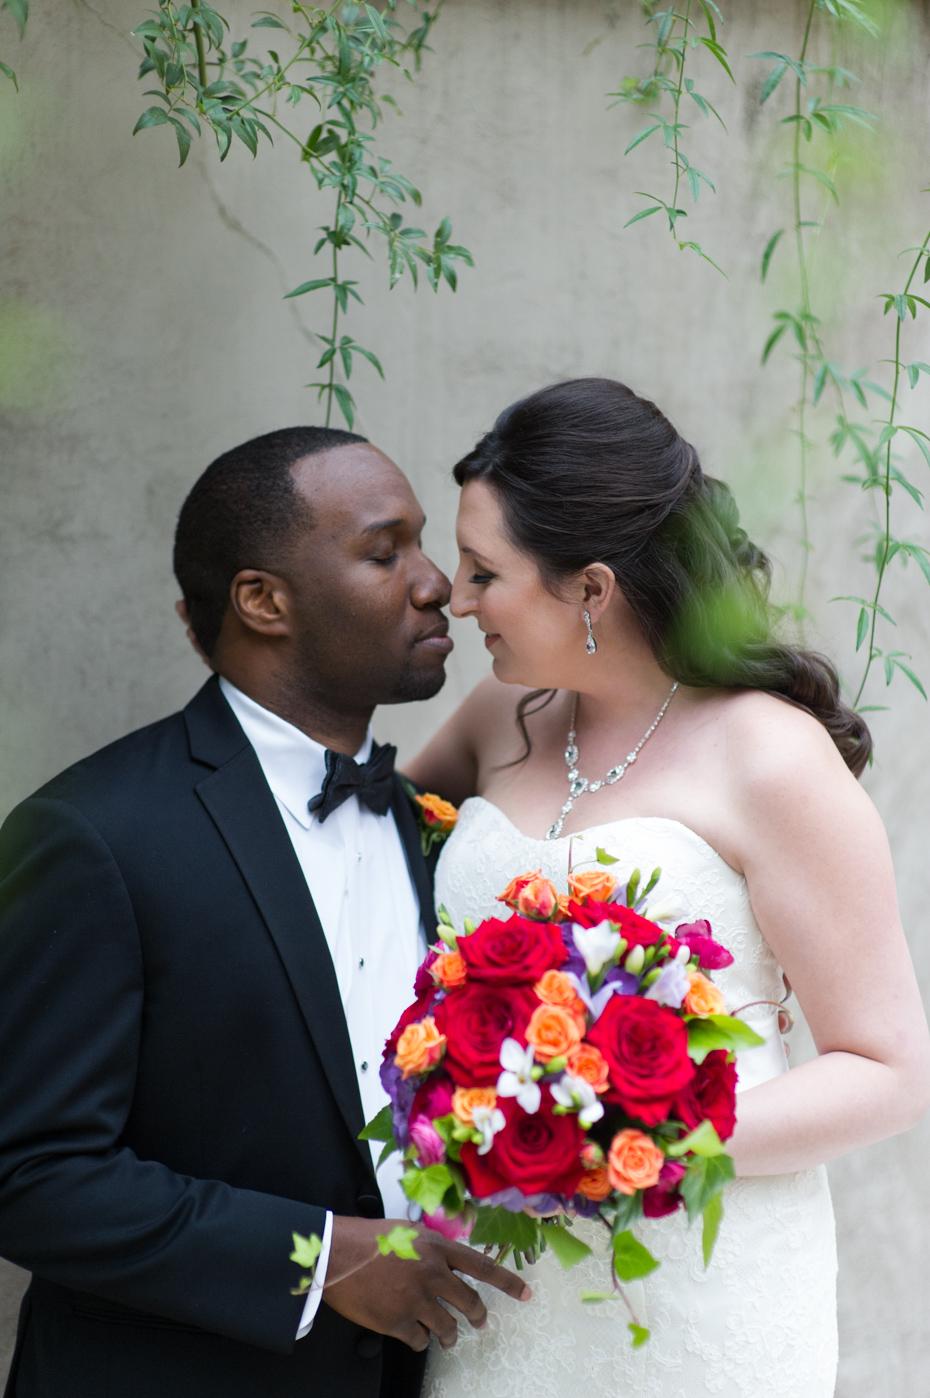 Atlanta History Center Wedding by The Studio B Photography